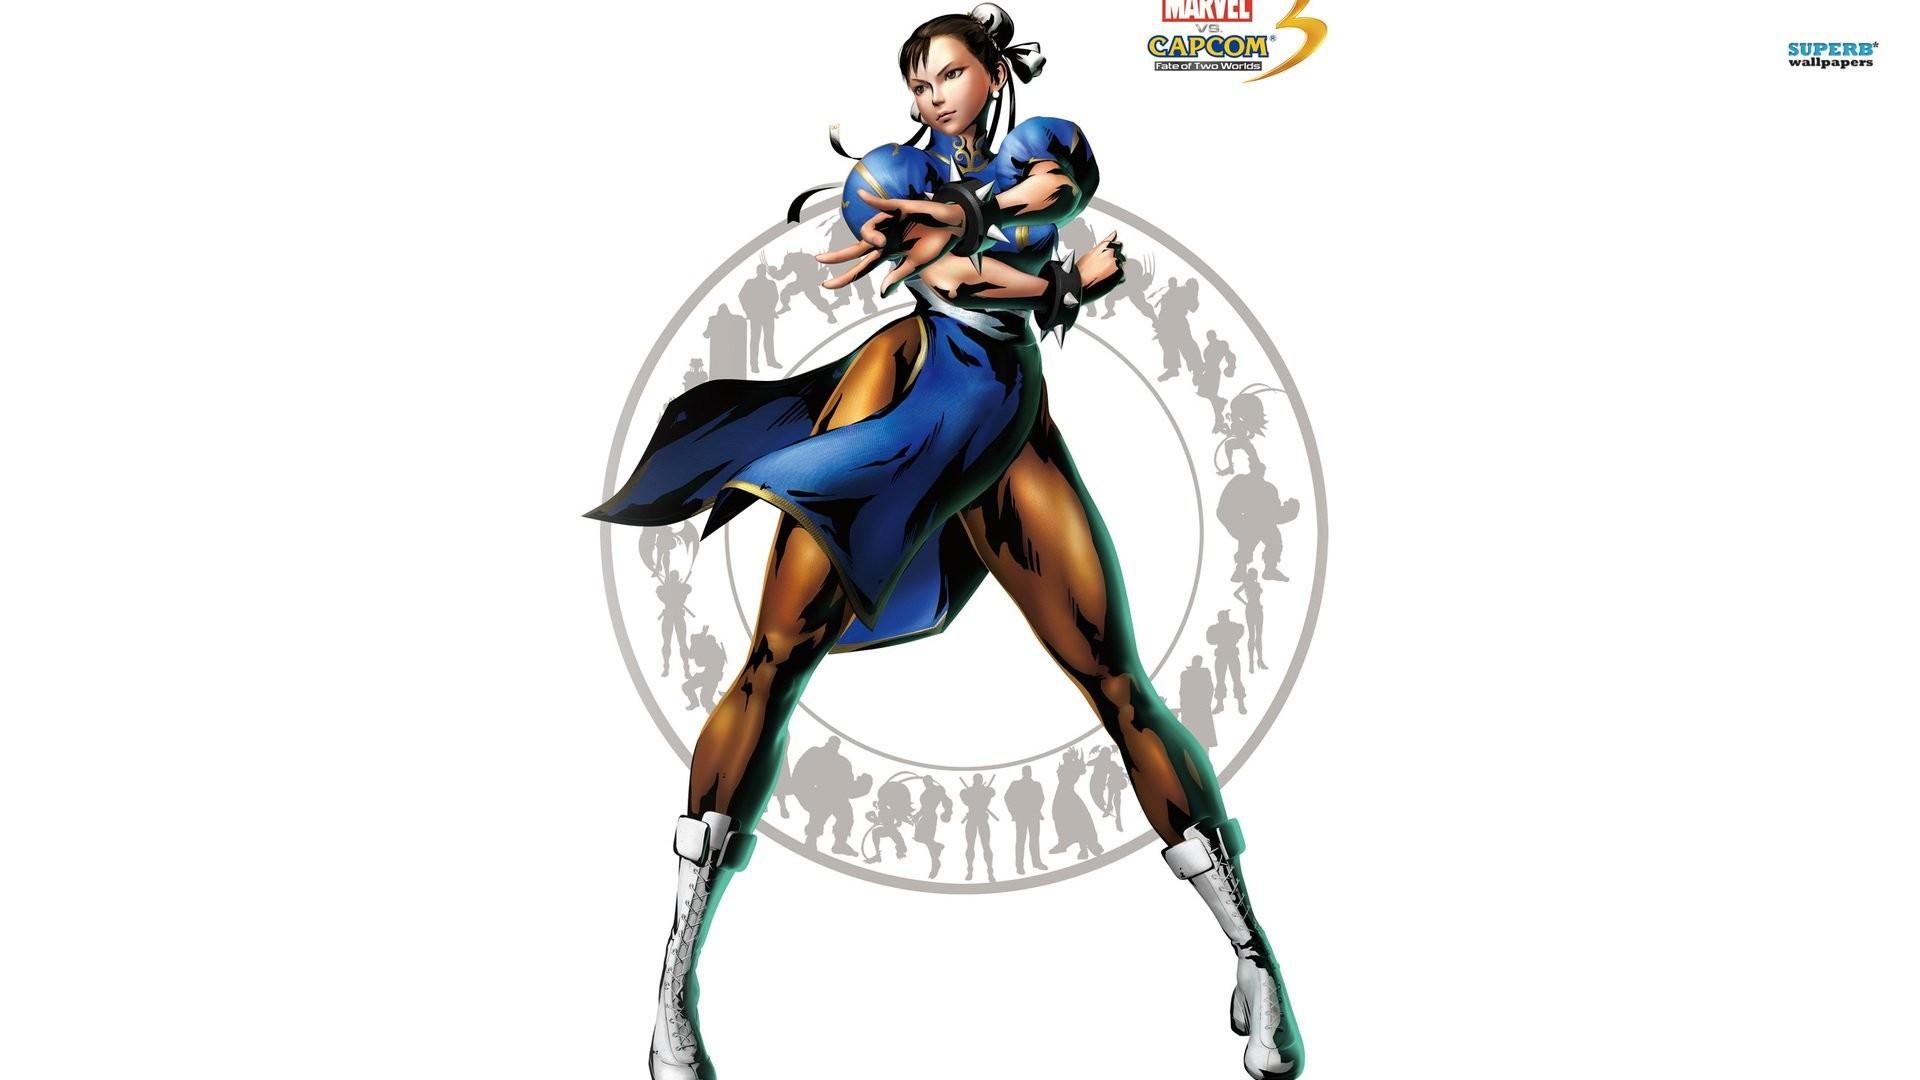 Marvel Vs. Capcom 3 – Chun-Li 238591